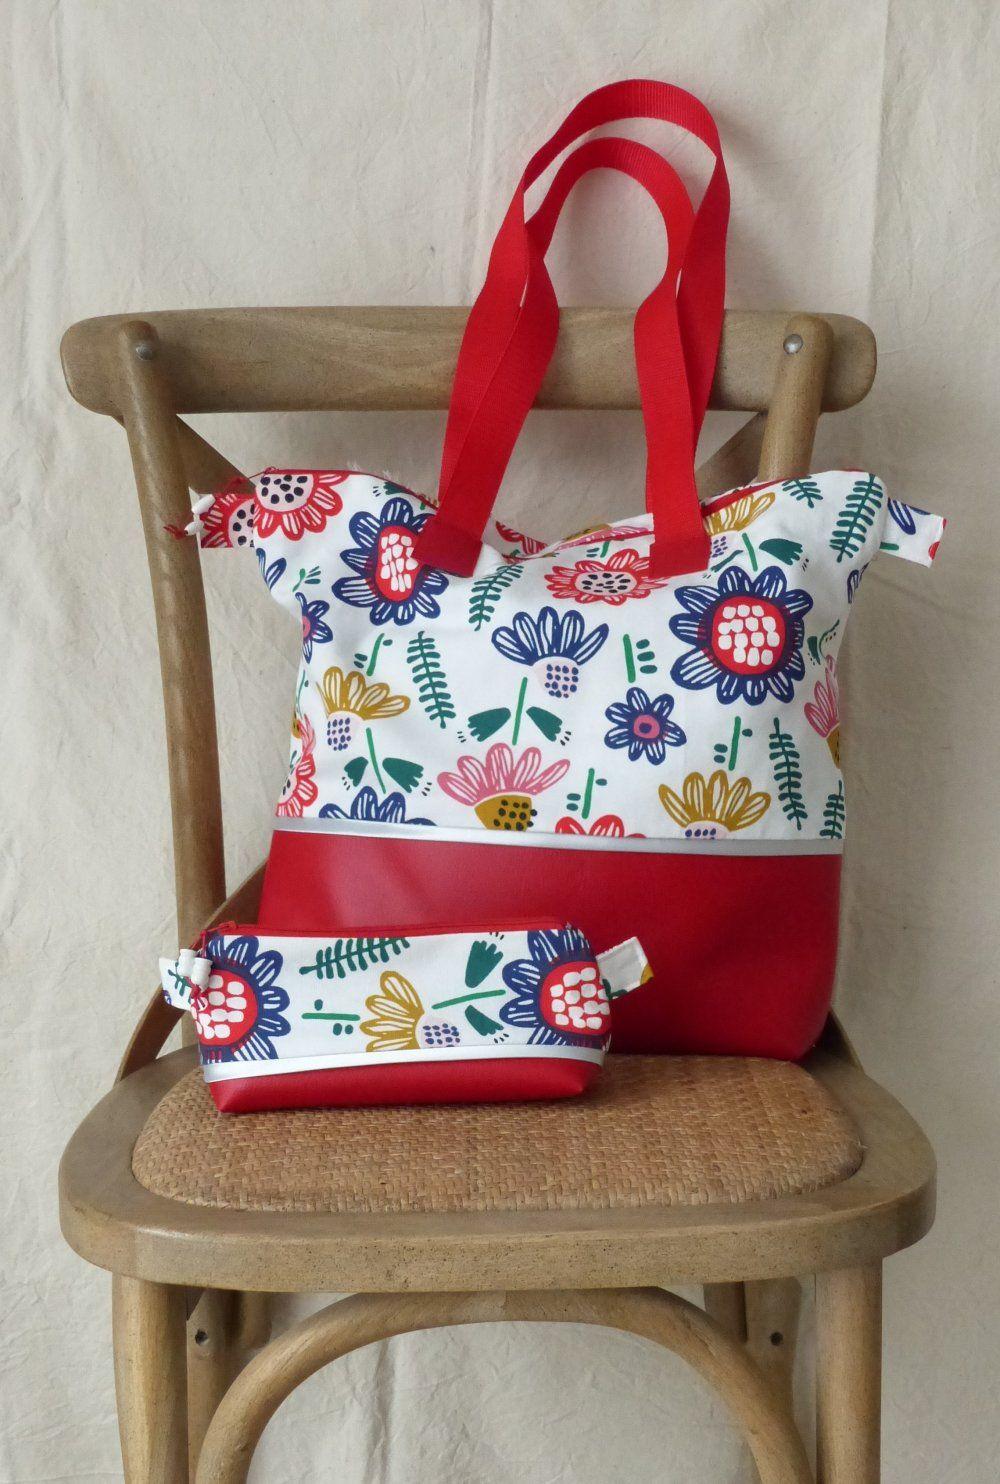 2fd384b6e5 Sac cabas ou tot bag,tissu fleuri et simili cuir rouge,anse rouge ...